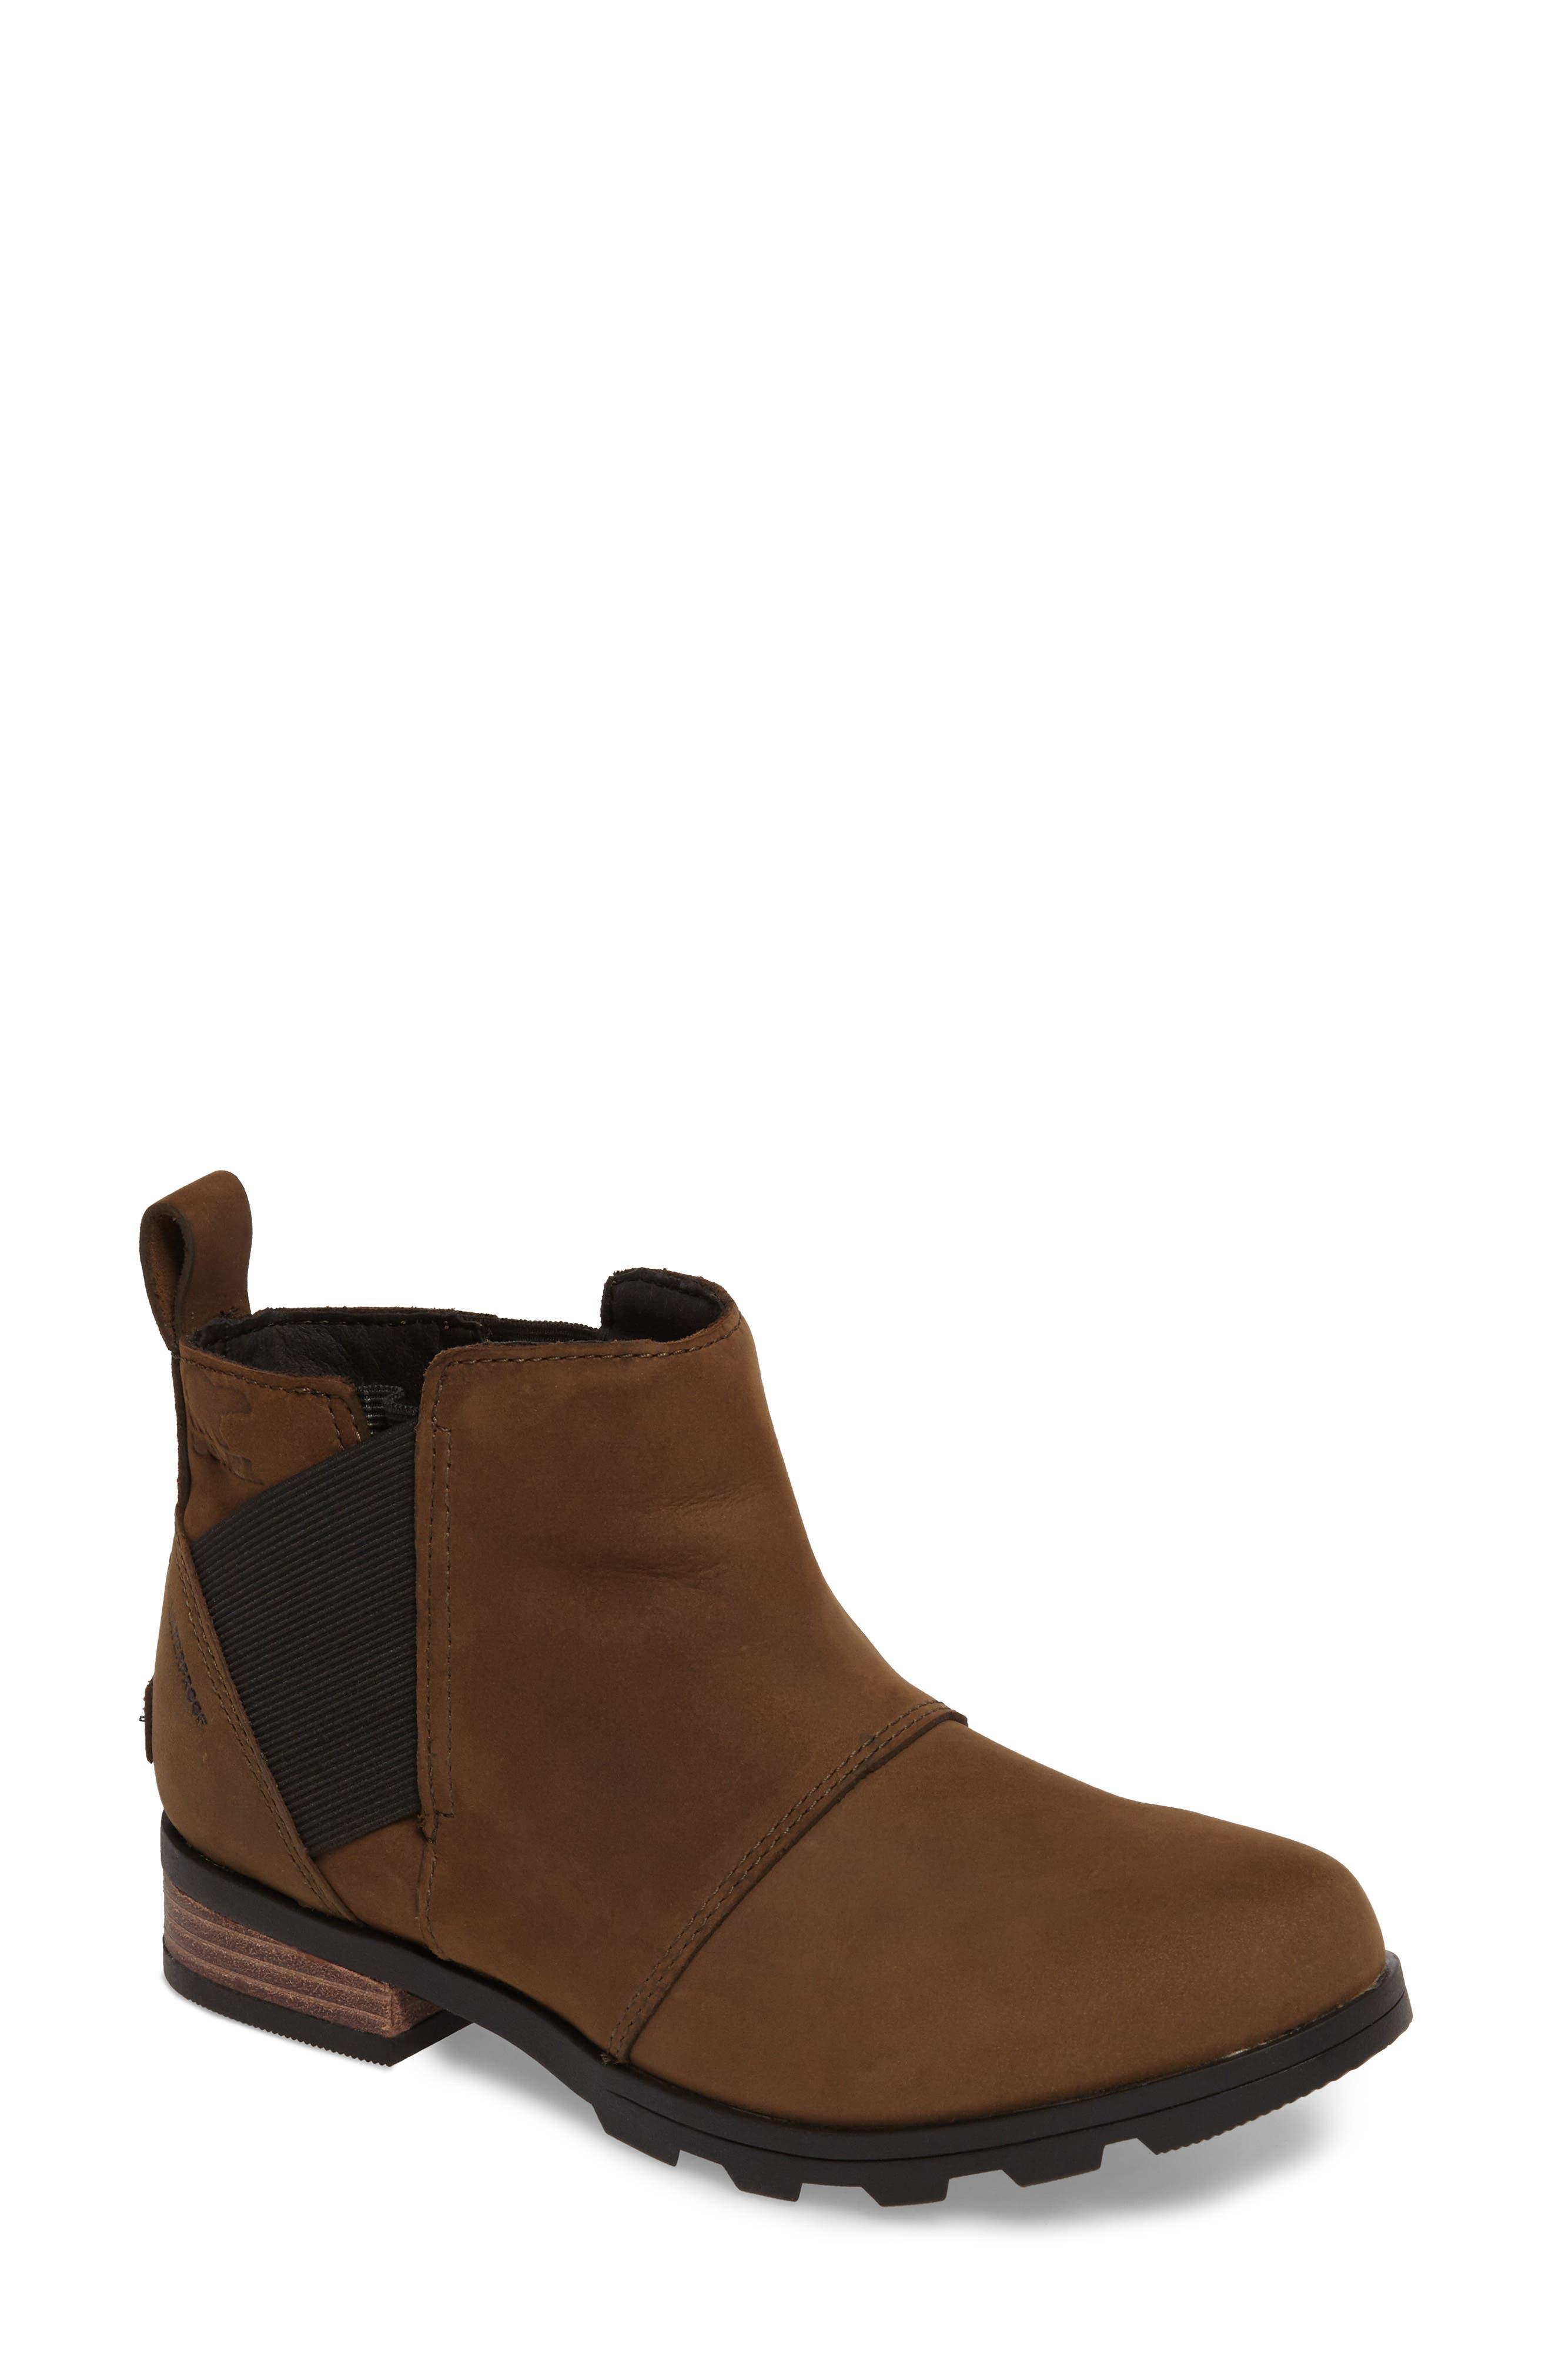 Emelie Waterproof Chelsea Boot,                             Main thumbnail 4, color,